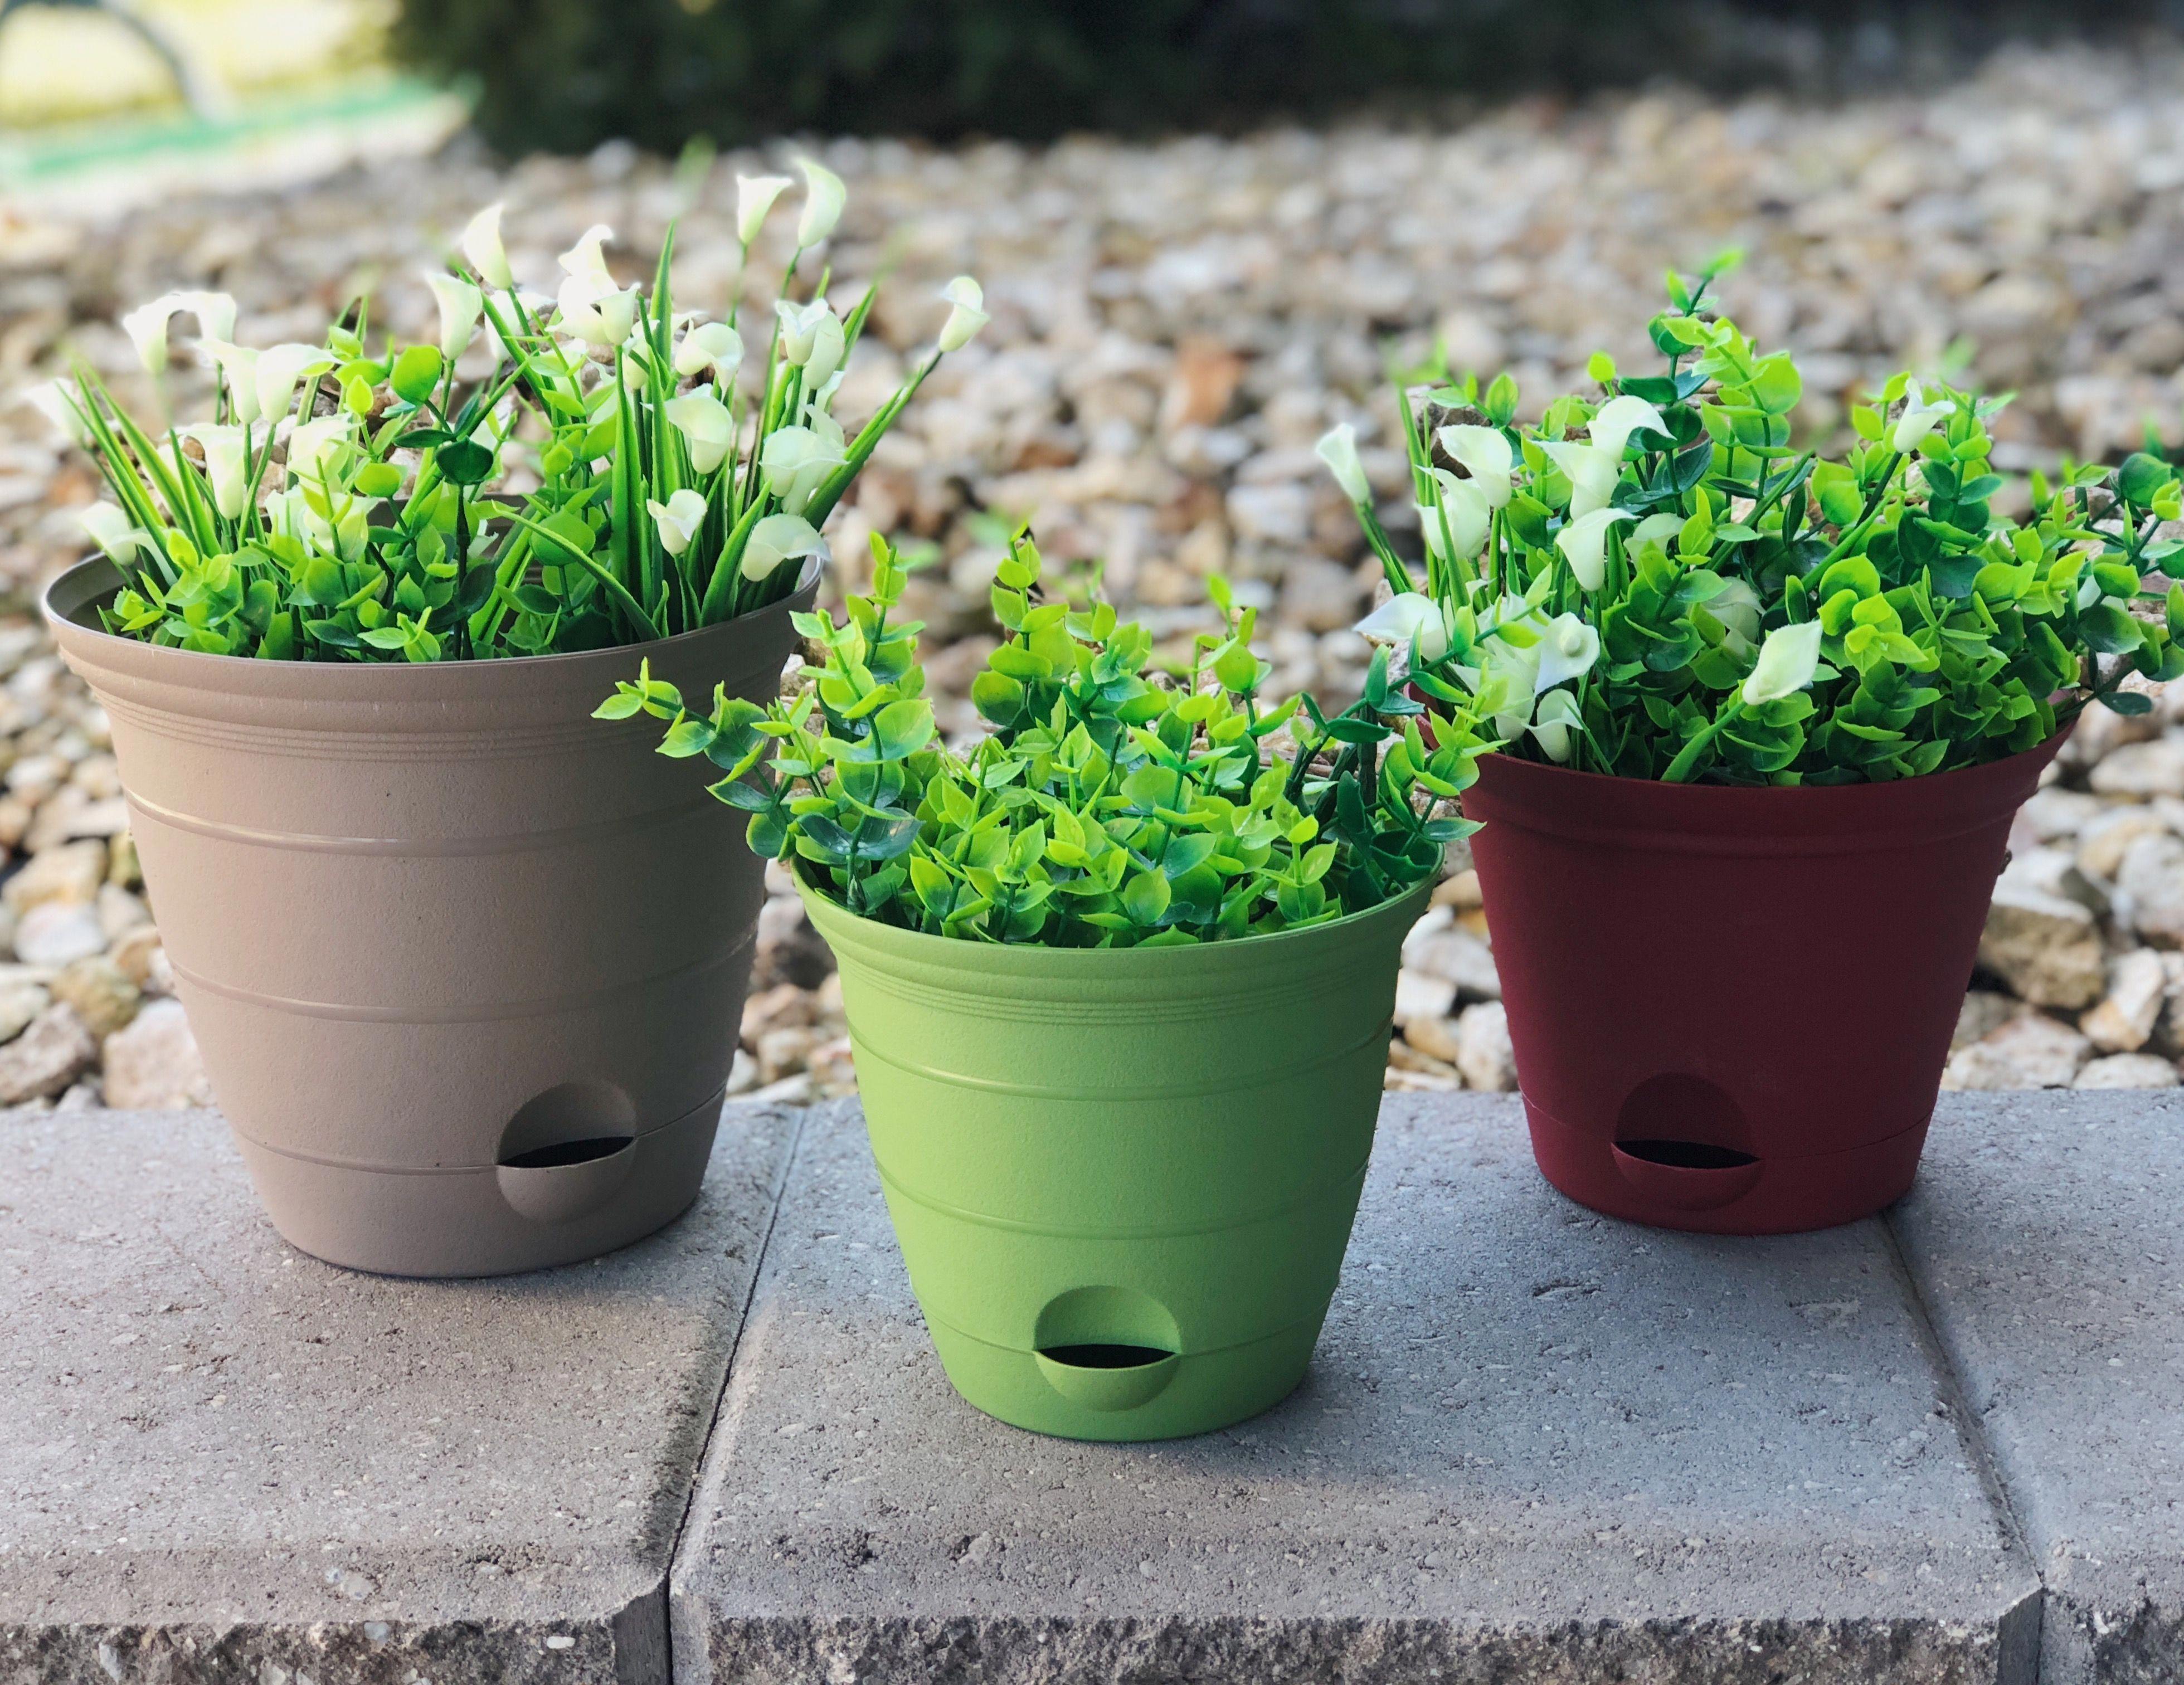 Misco 8 Inch Self Watering Terra Flower Plant Pot Garden